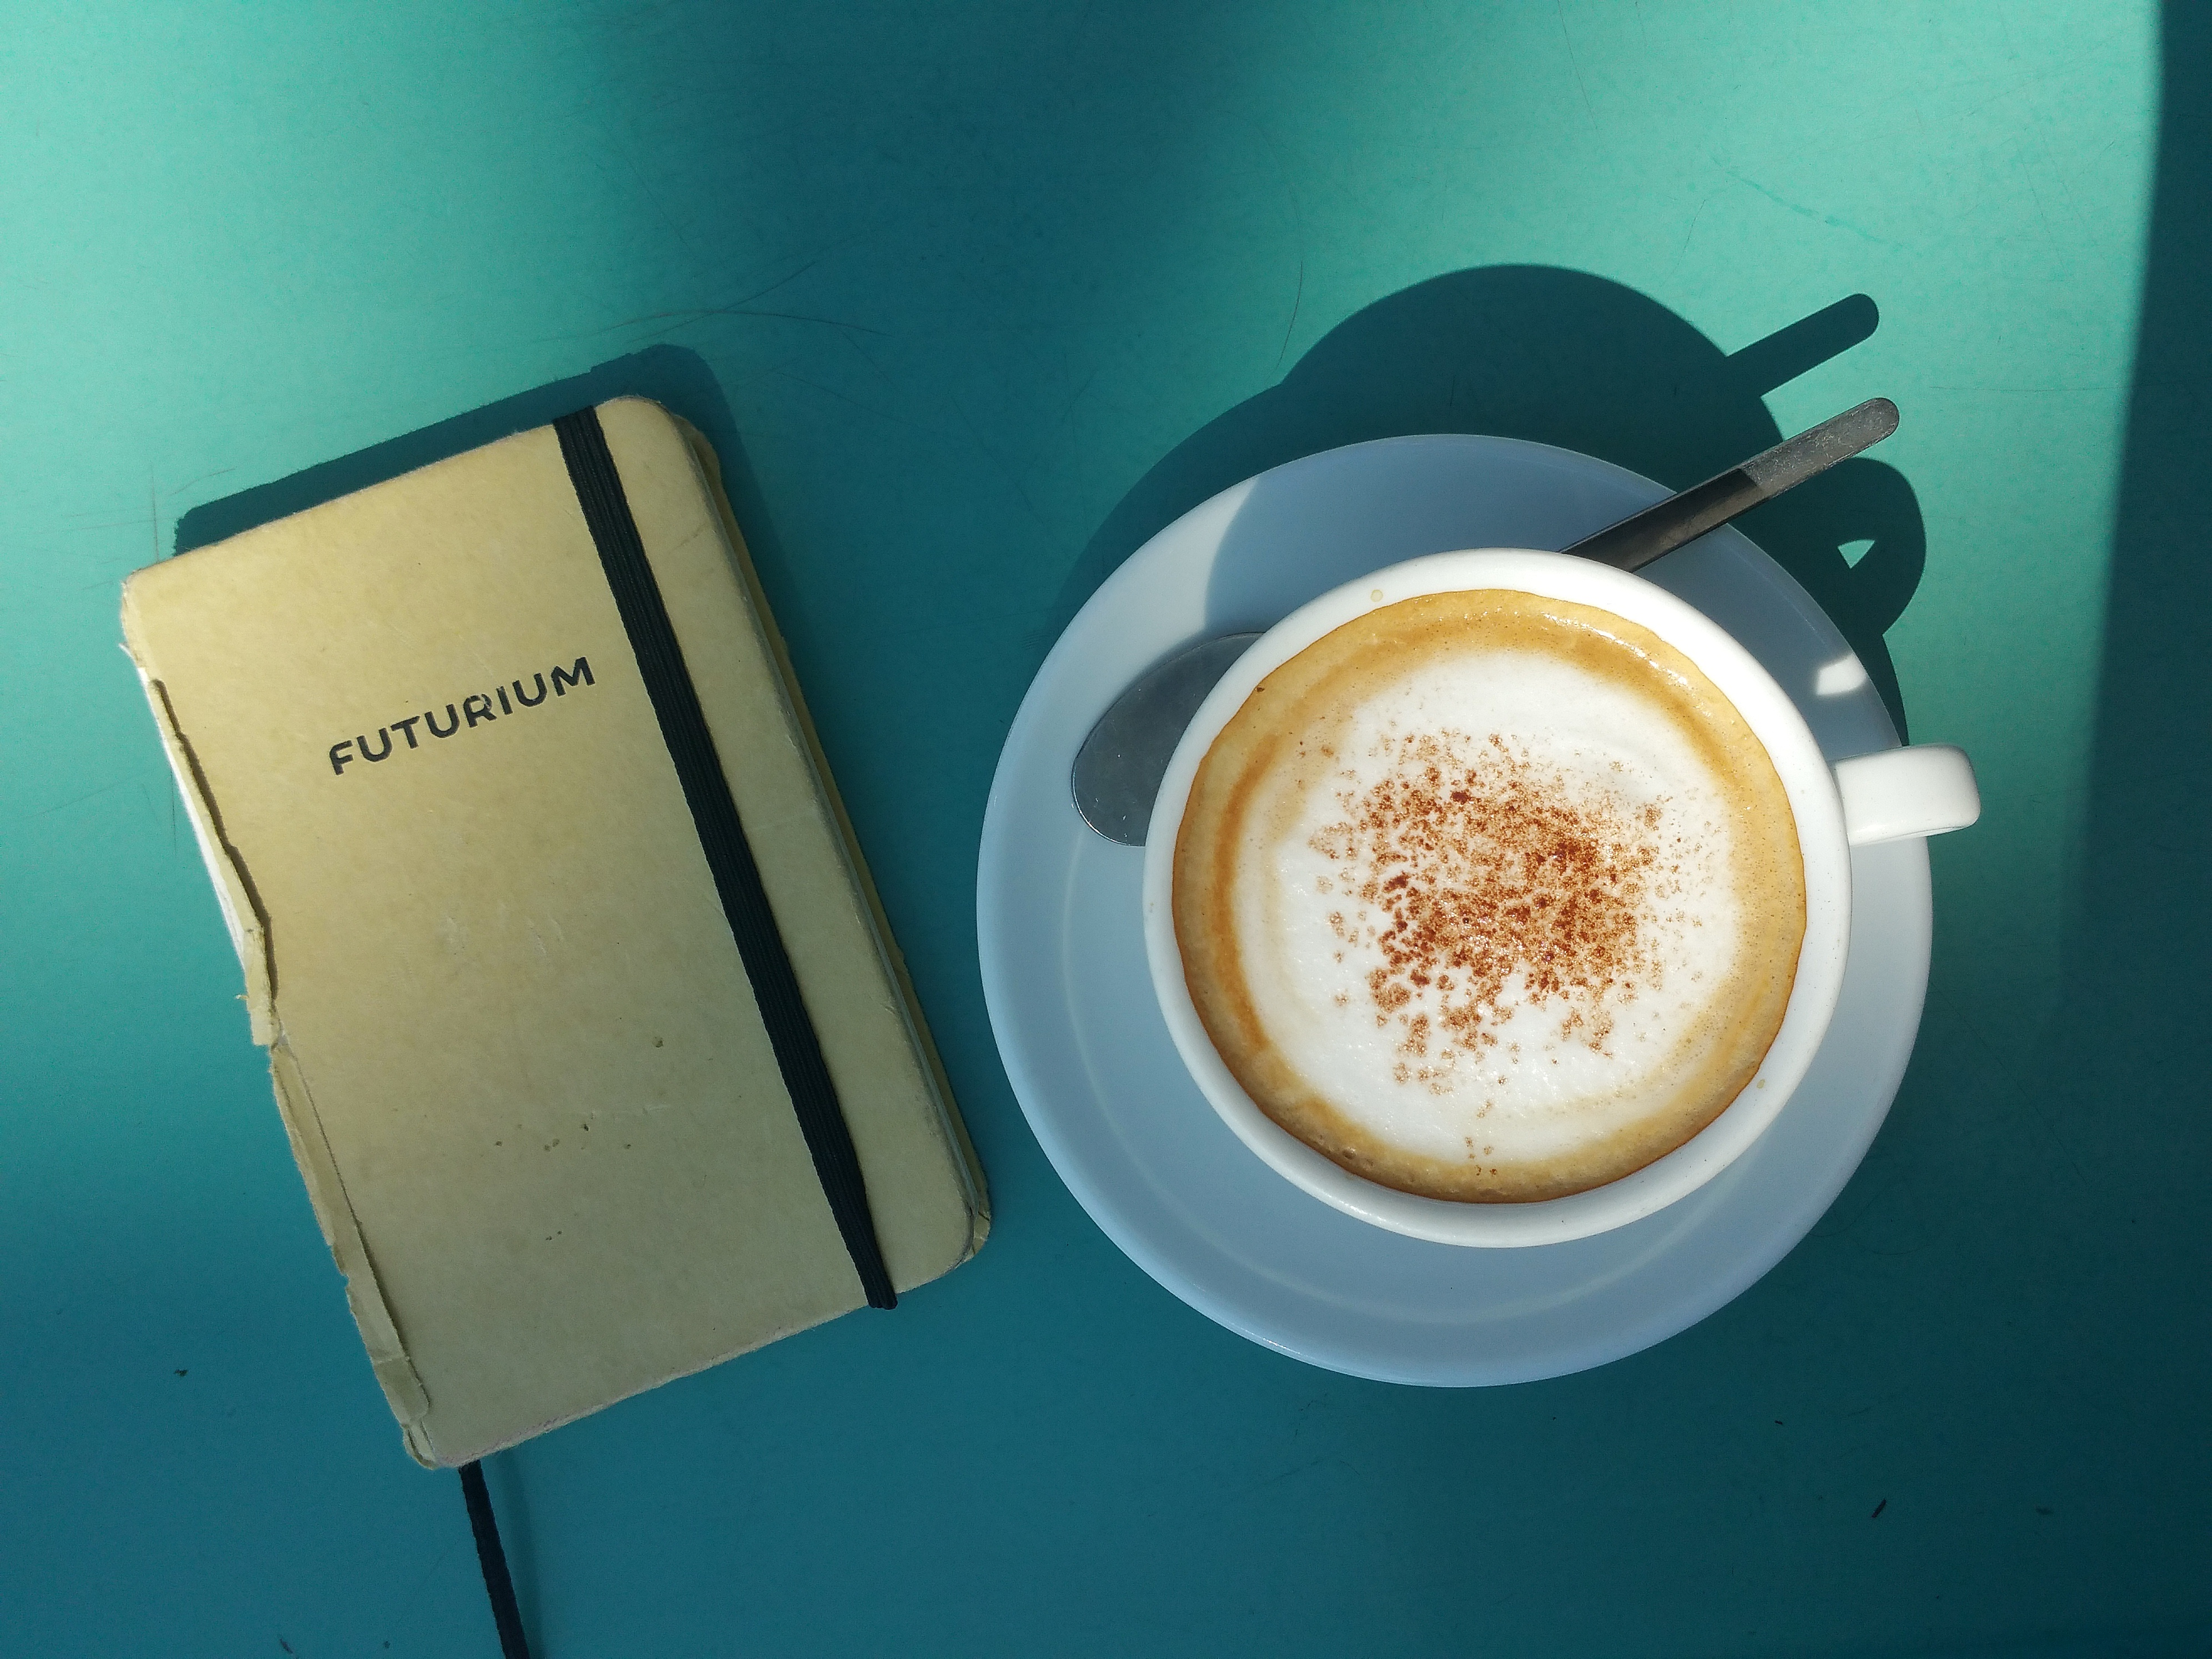 Cafe Futurium|©Anne Seubert